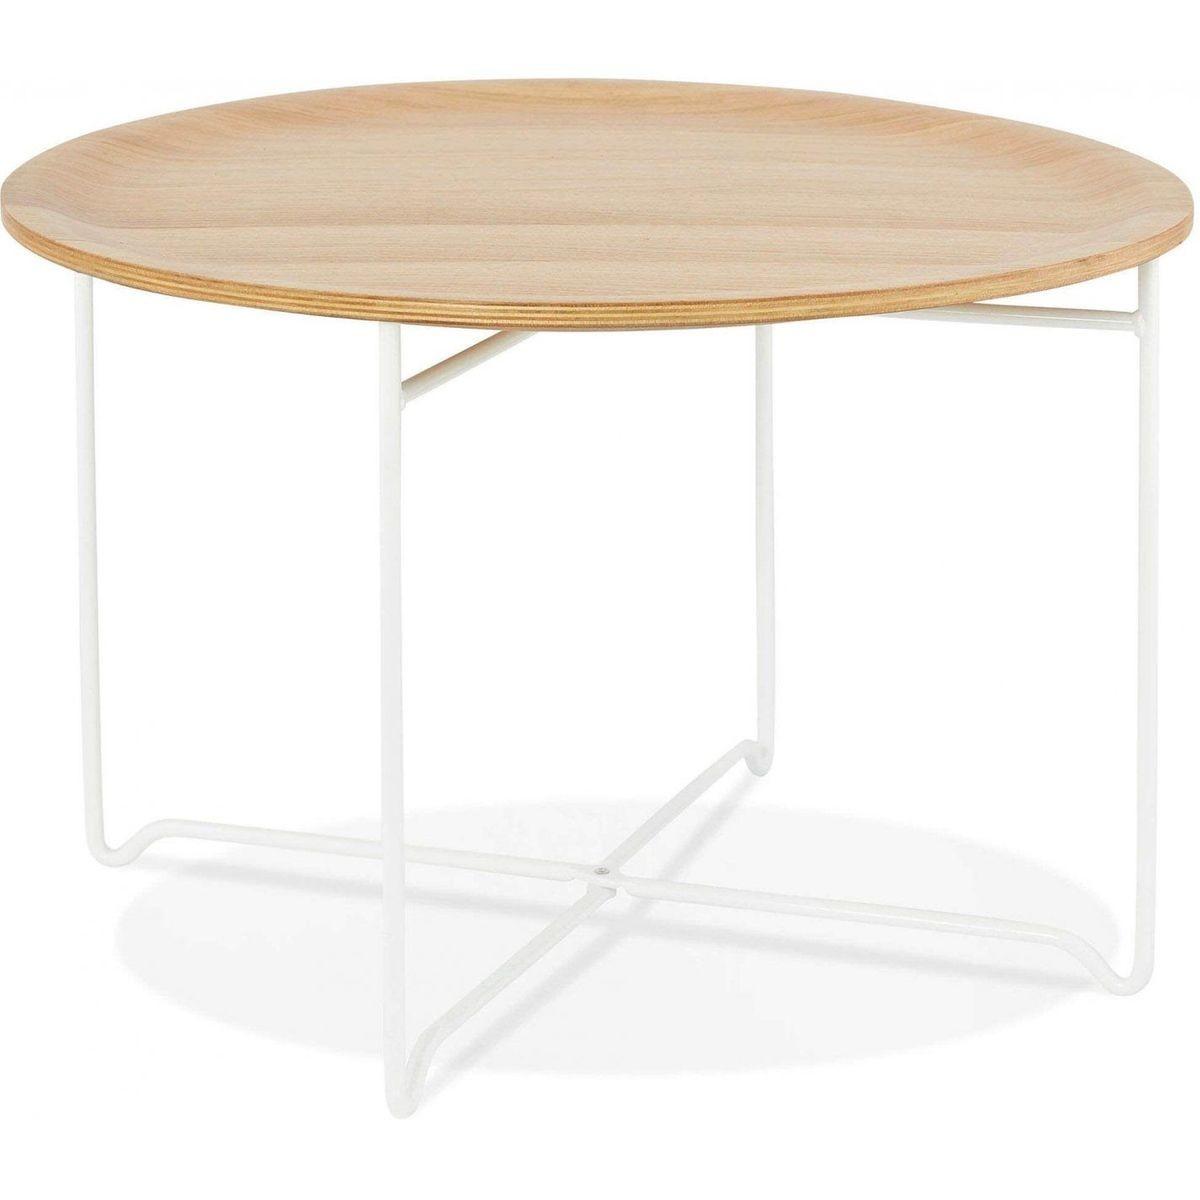 Table Basse Design Bois Bois Marea Taille Tu Table Basse